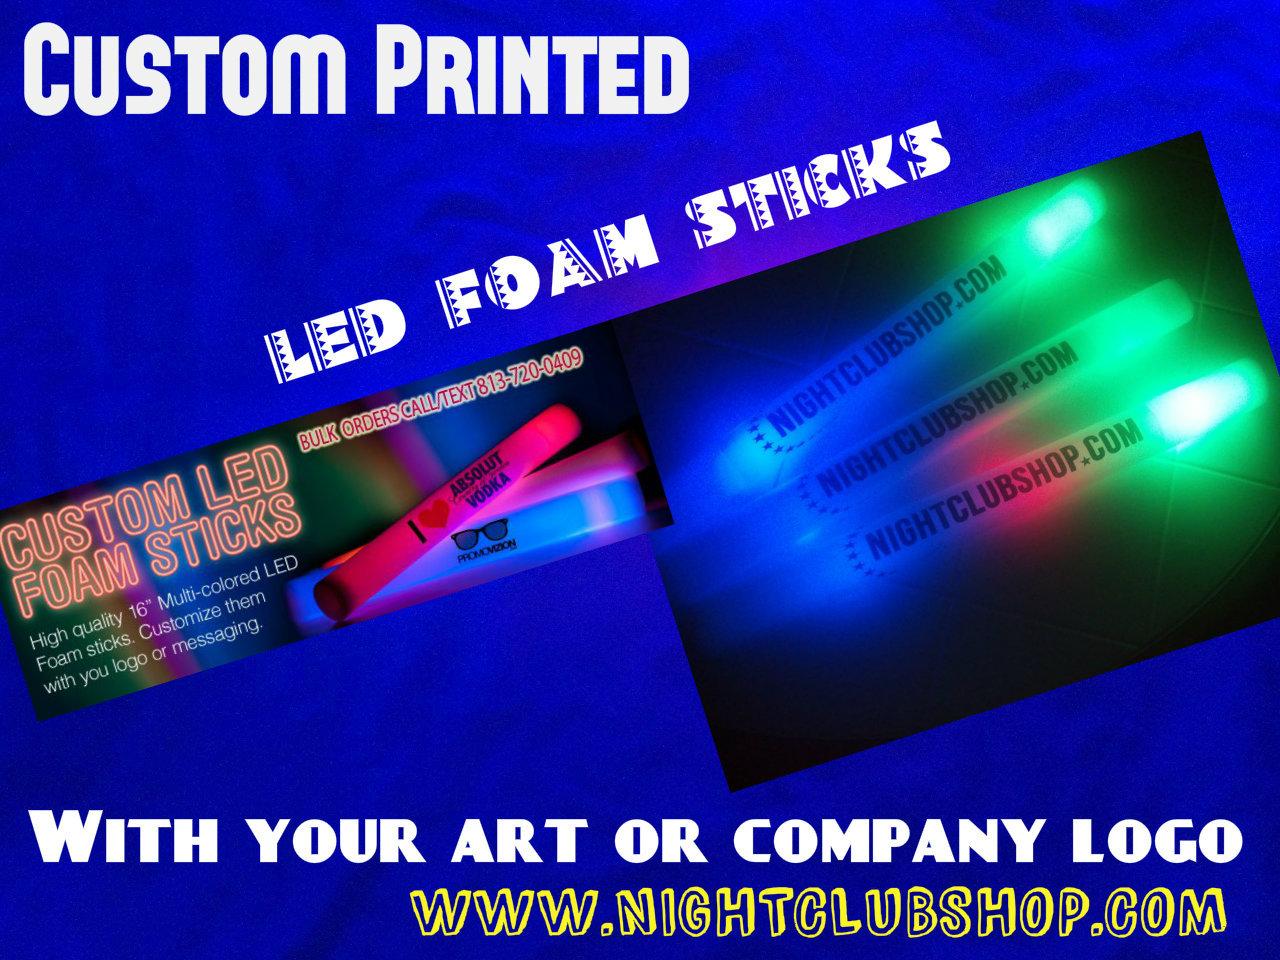 Wedding Custom Led Foam Sticks 16 Inch High Quality 7 Function Noodles Stick